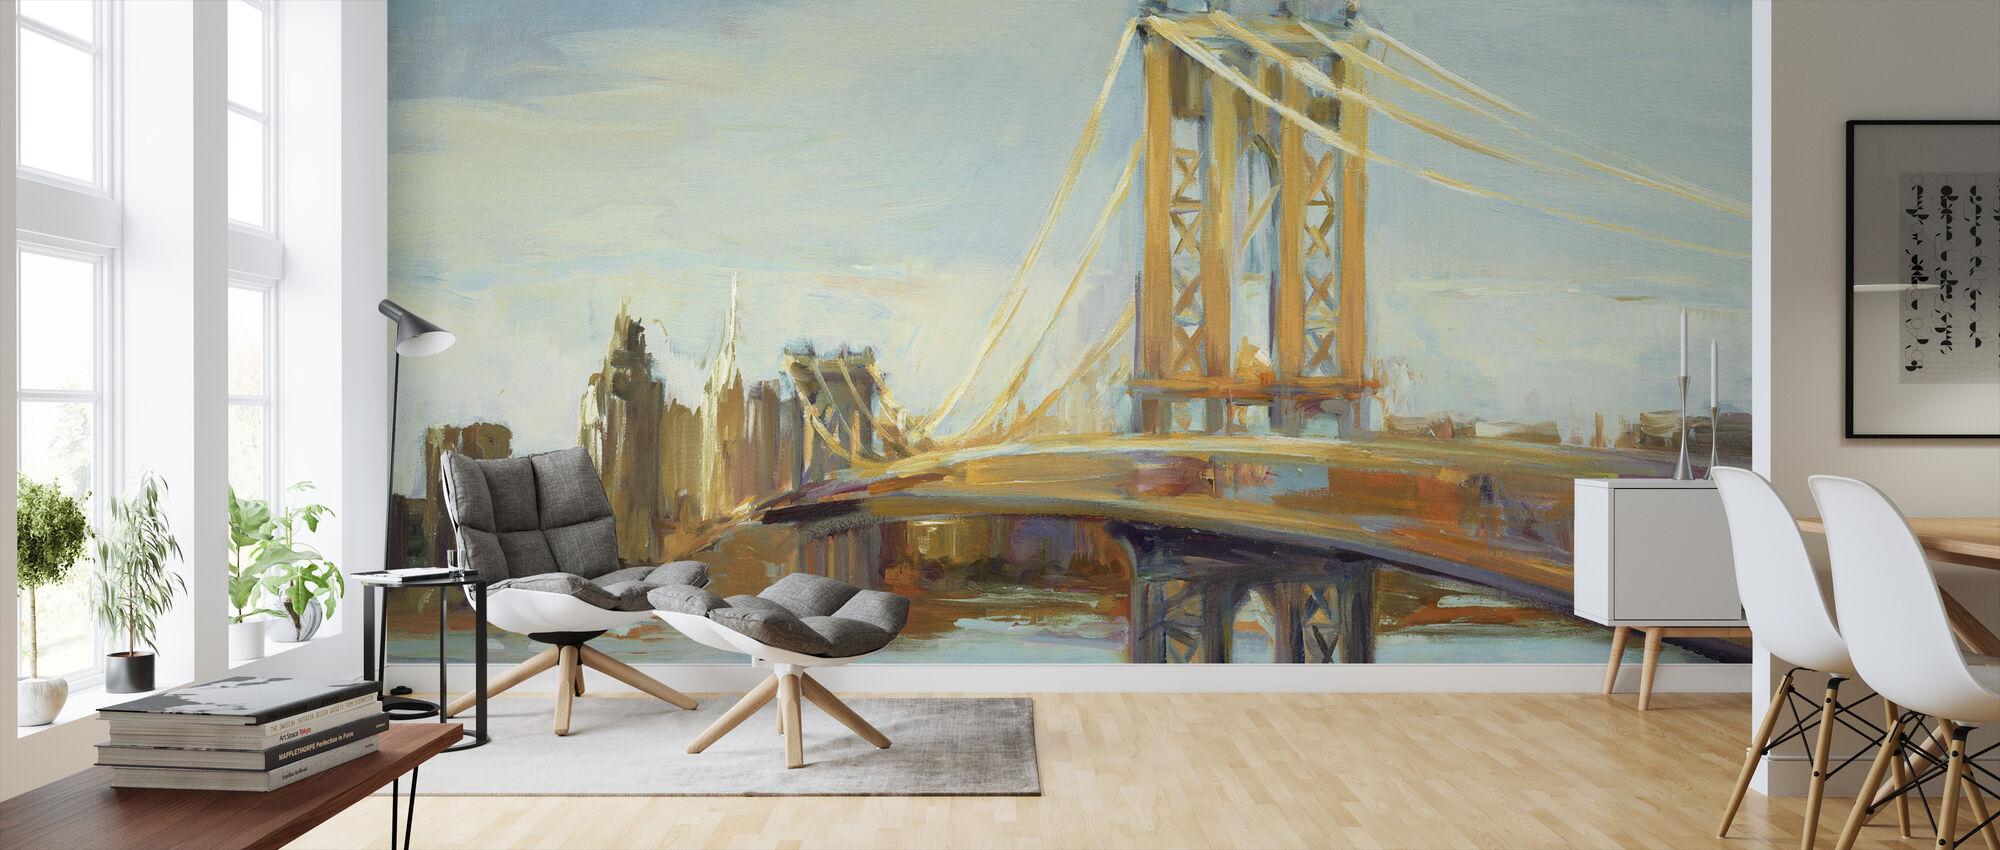 Sunny Manhattan Bridge - Wallpaper - Living Room